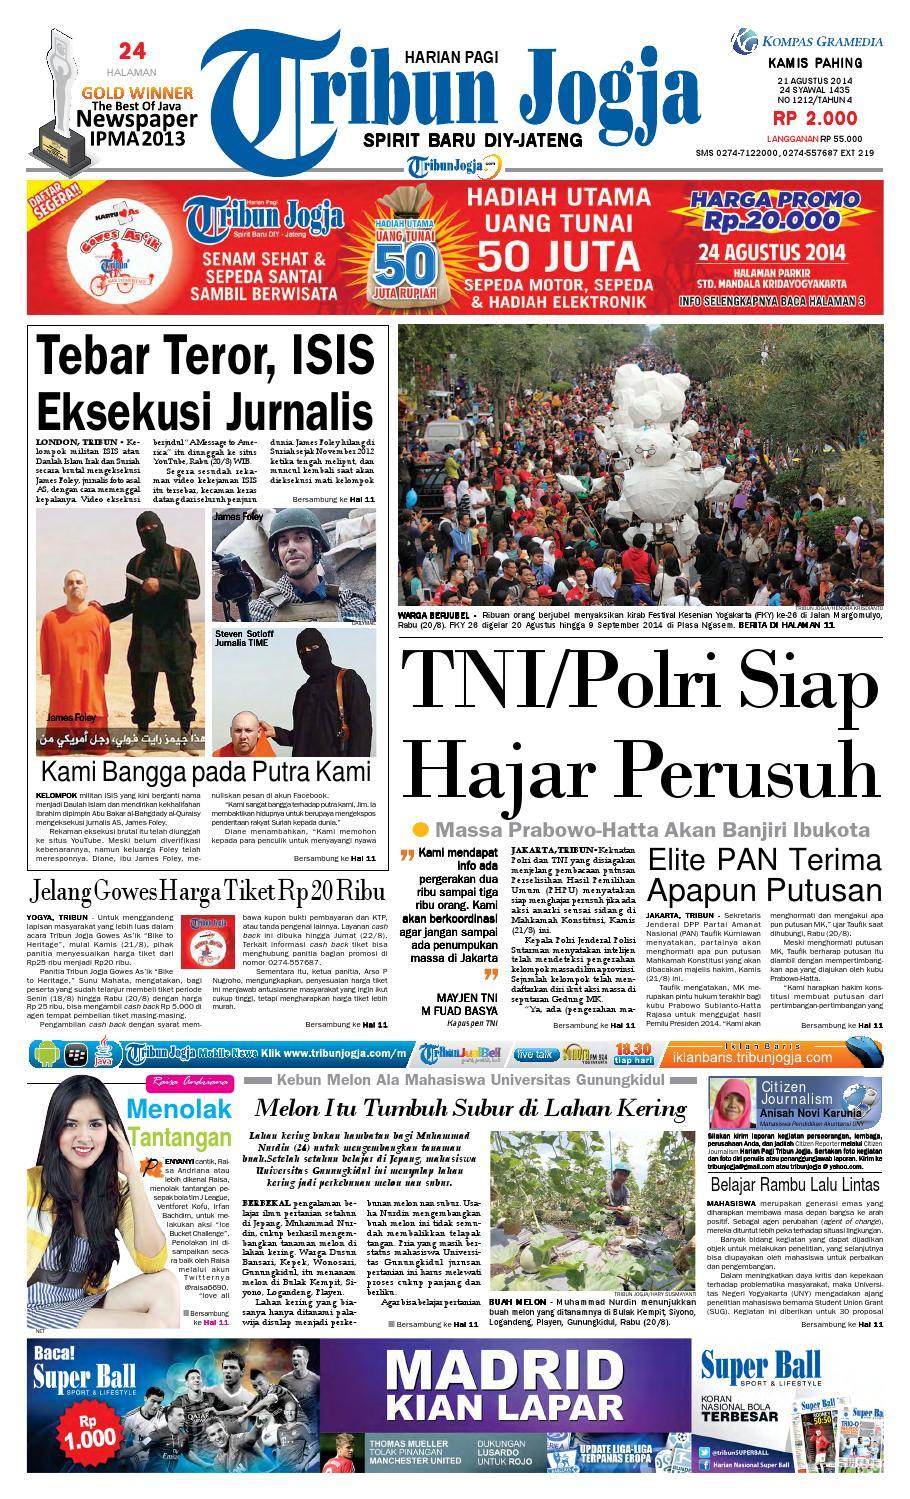 Tribunjogja 21 08 2014 By Tribun Jogja Issuu Tcash Vaganza 32 Milo Malaysia Activ Go